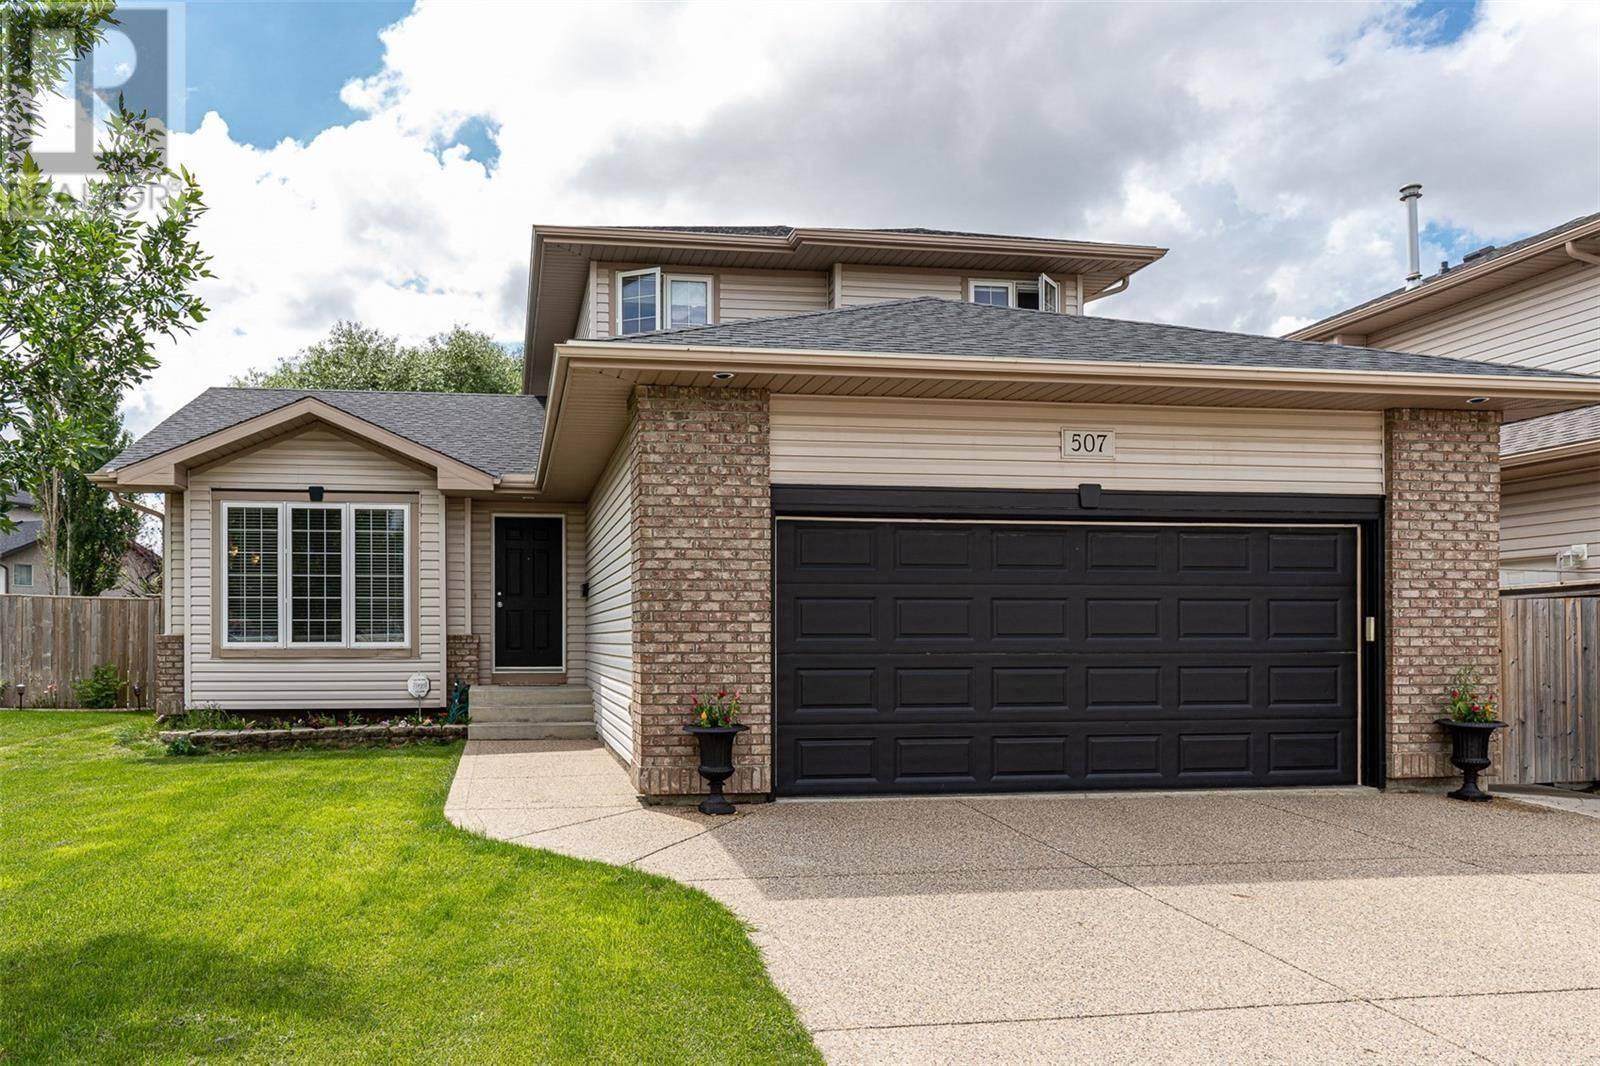 House for sale at 507 Kucey Cres Saskatoon Saskatchewan - MLS: SK781183